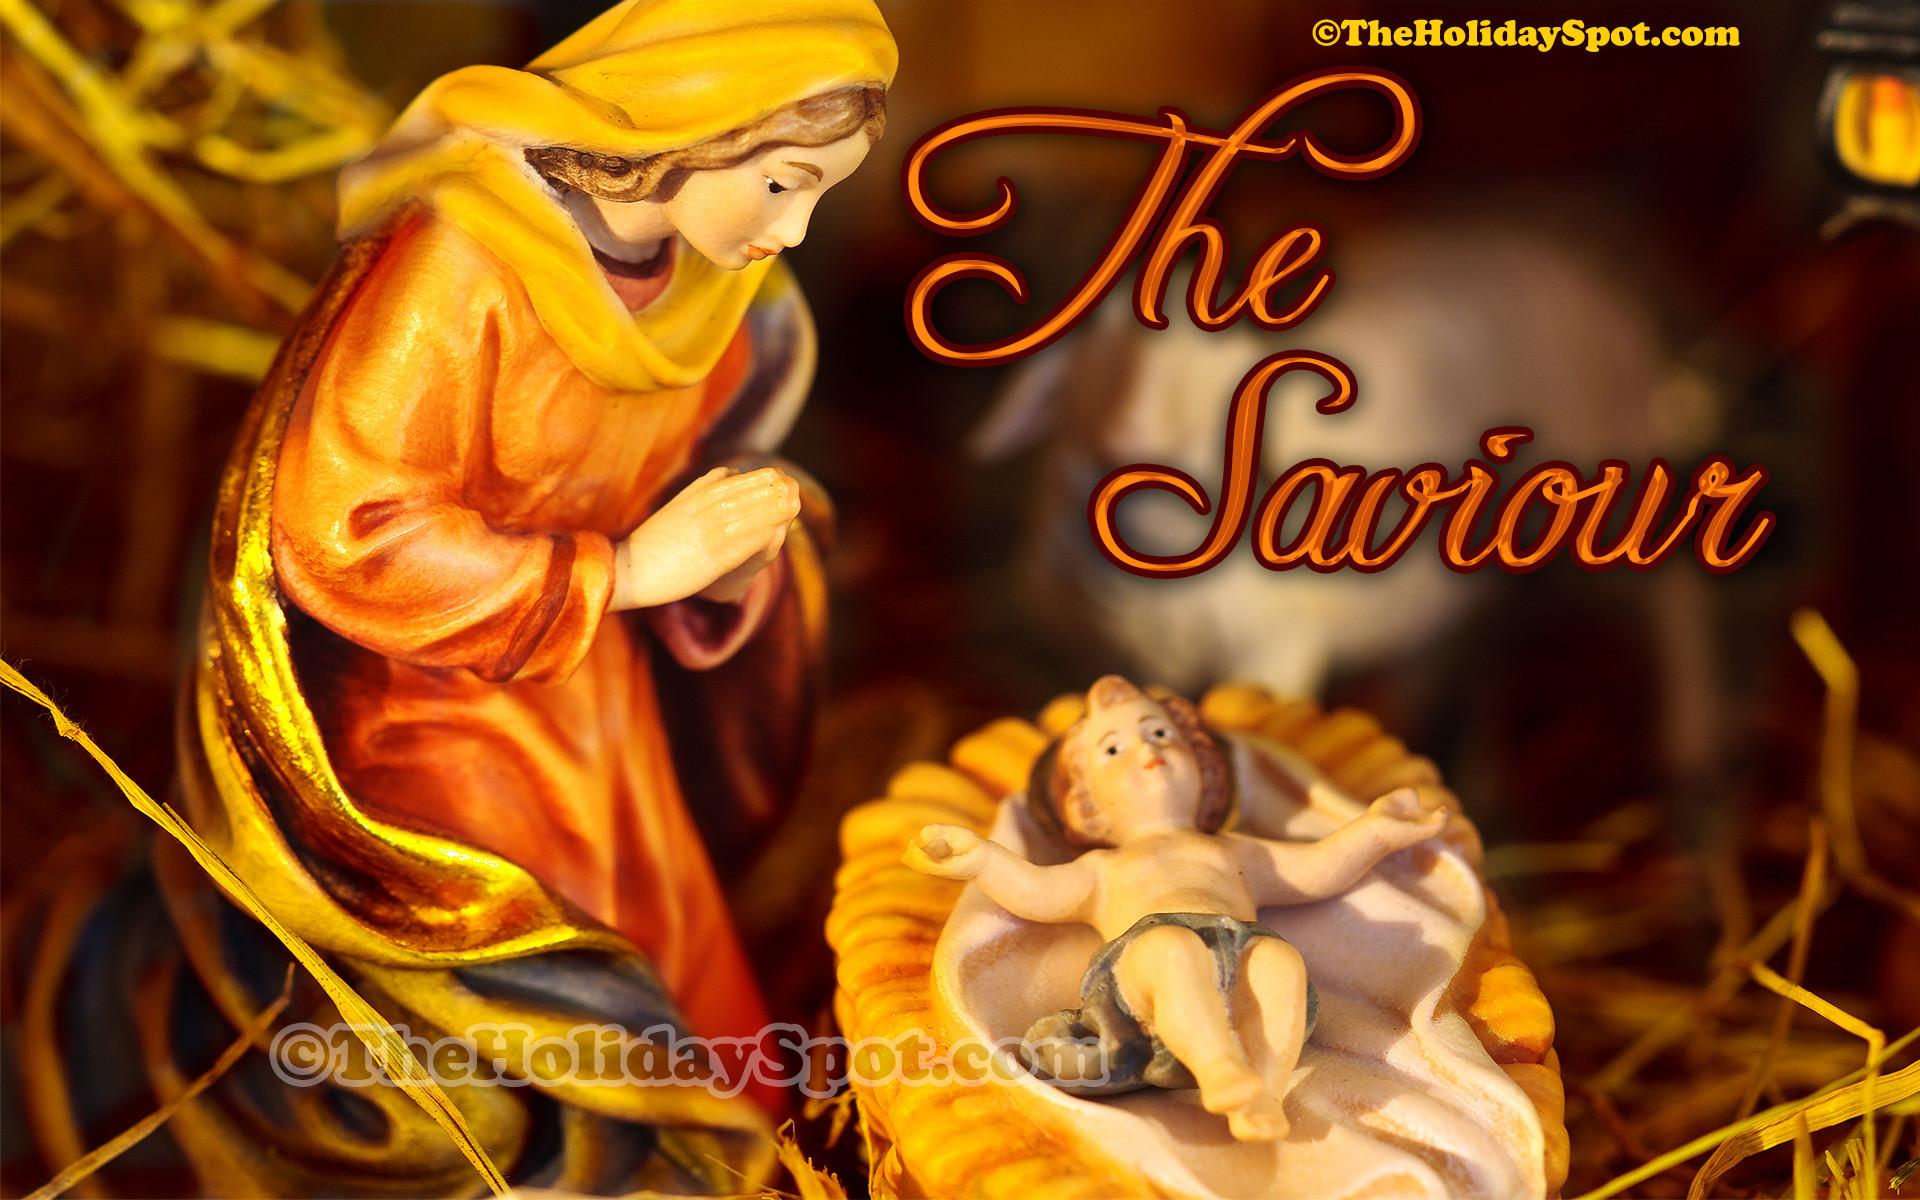 An elegant christmas wallpaper themed on birth of Christ.